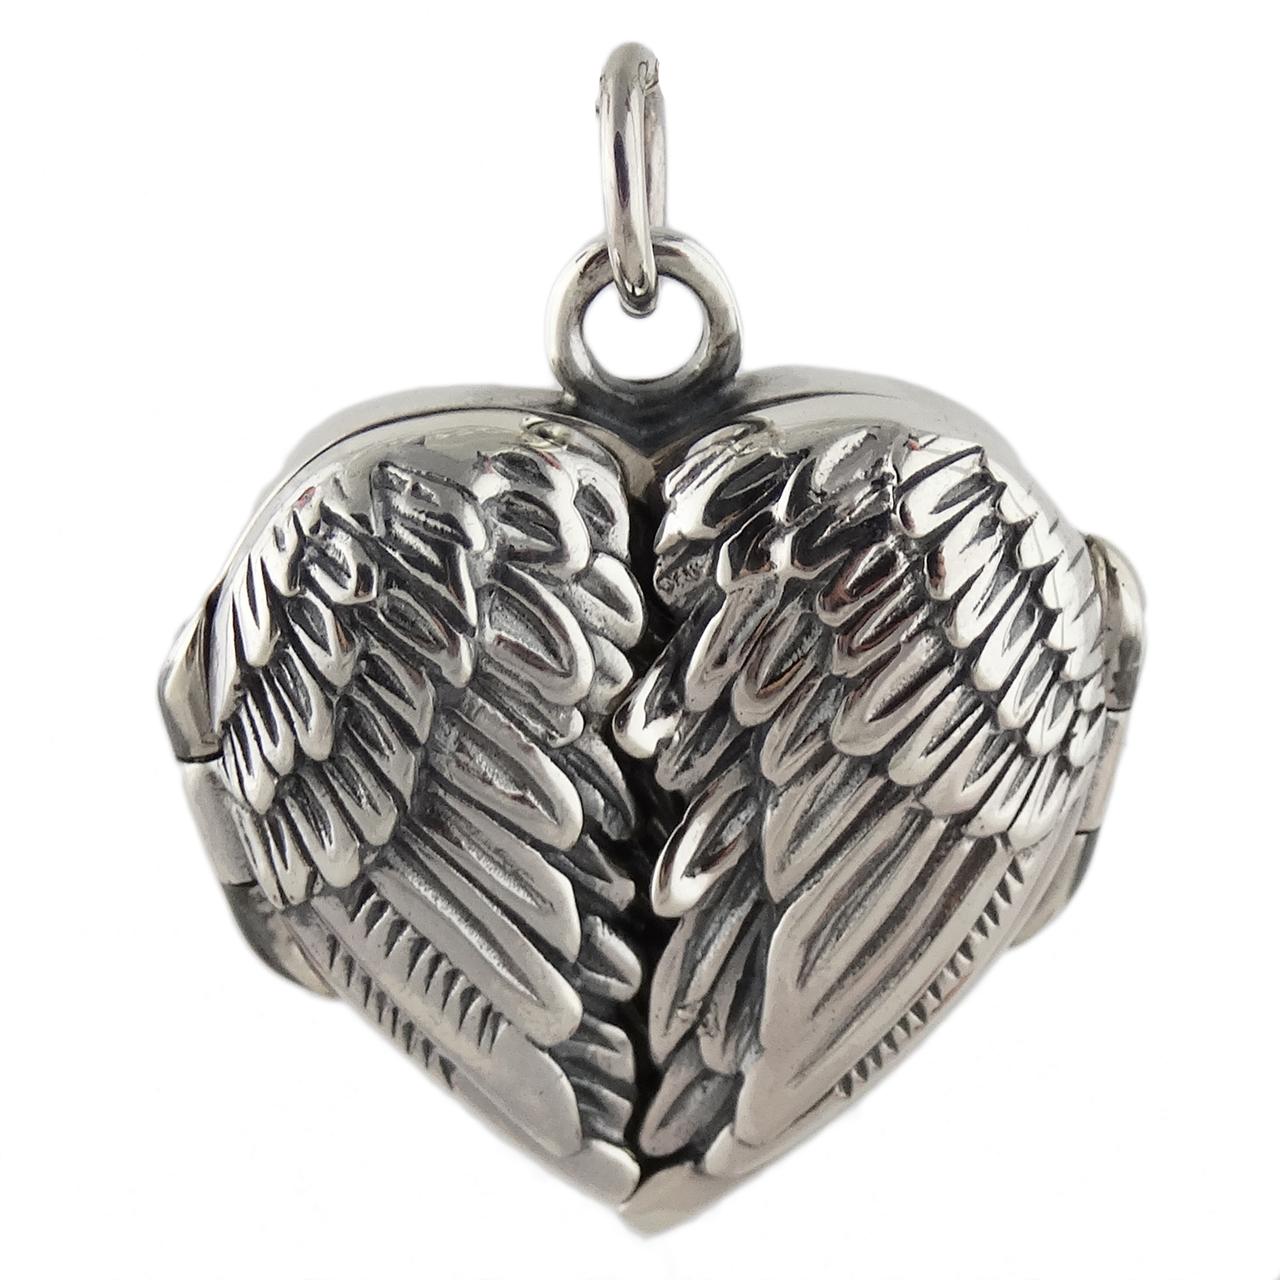 Angel Wings Heart Locket - 925 Sterling Silver - Love Gift Memorial Pendant NEW